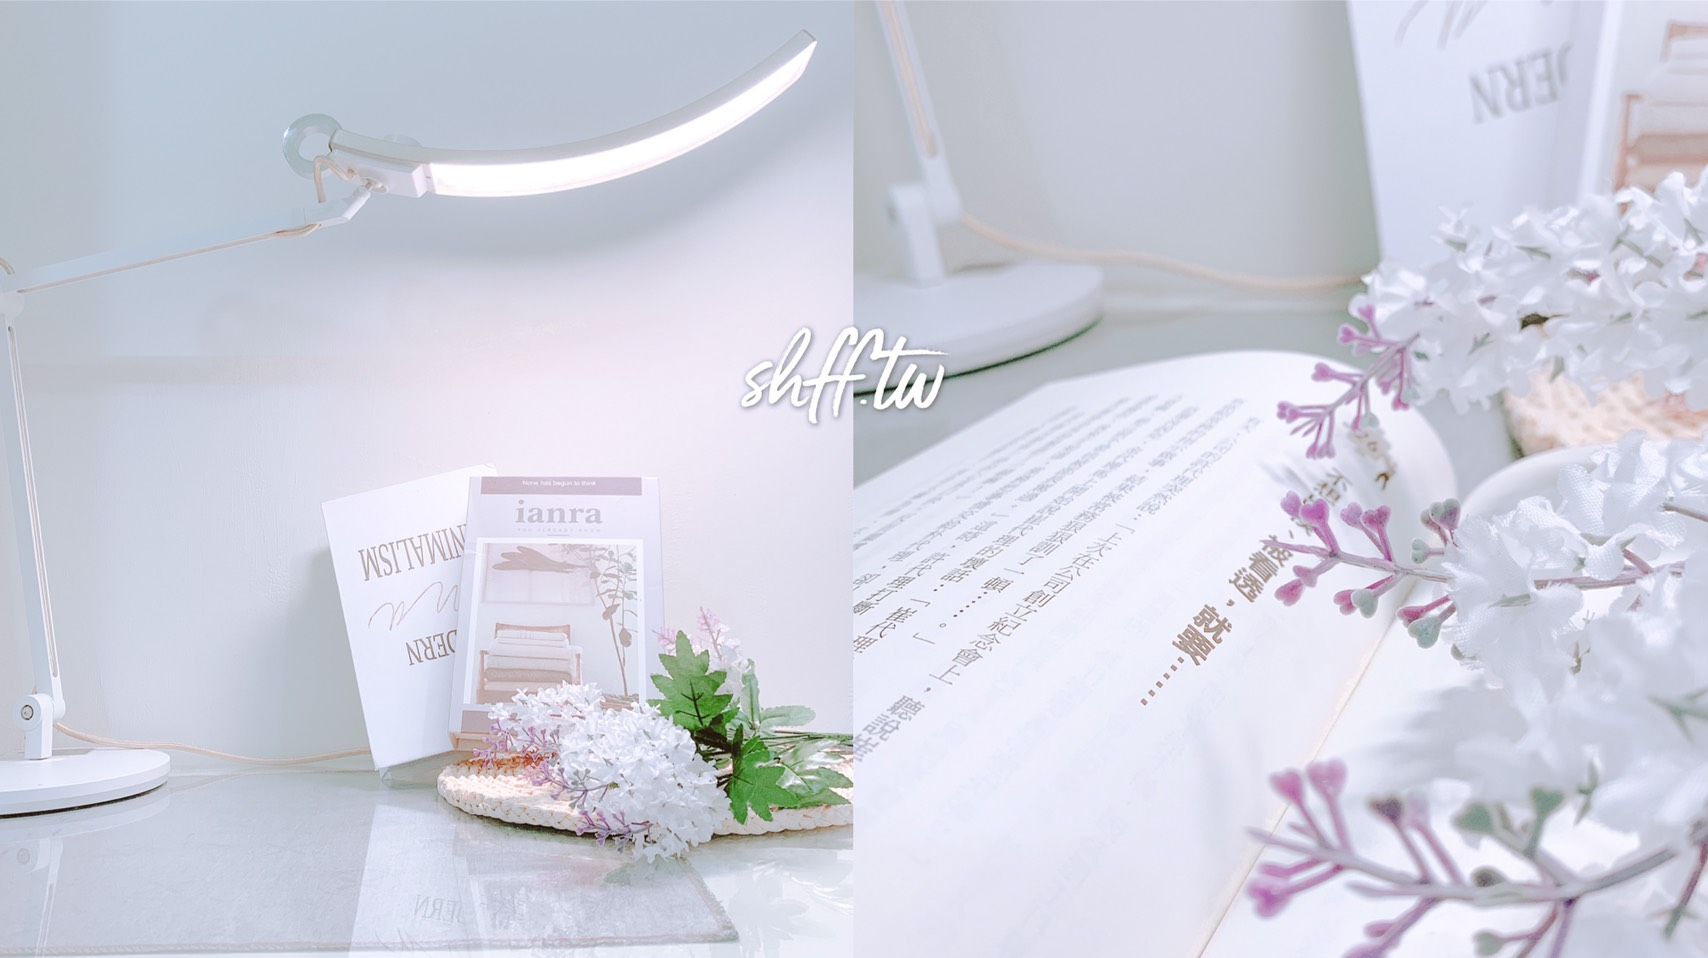 BenQ WiT 螢幕閱讀檯燈 智能調光升級版推薦,超美型精品級居家智慧檯燈,讓生活更有品味的護眼檯燈。